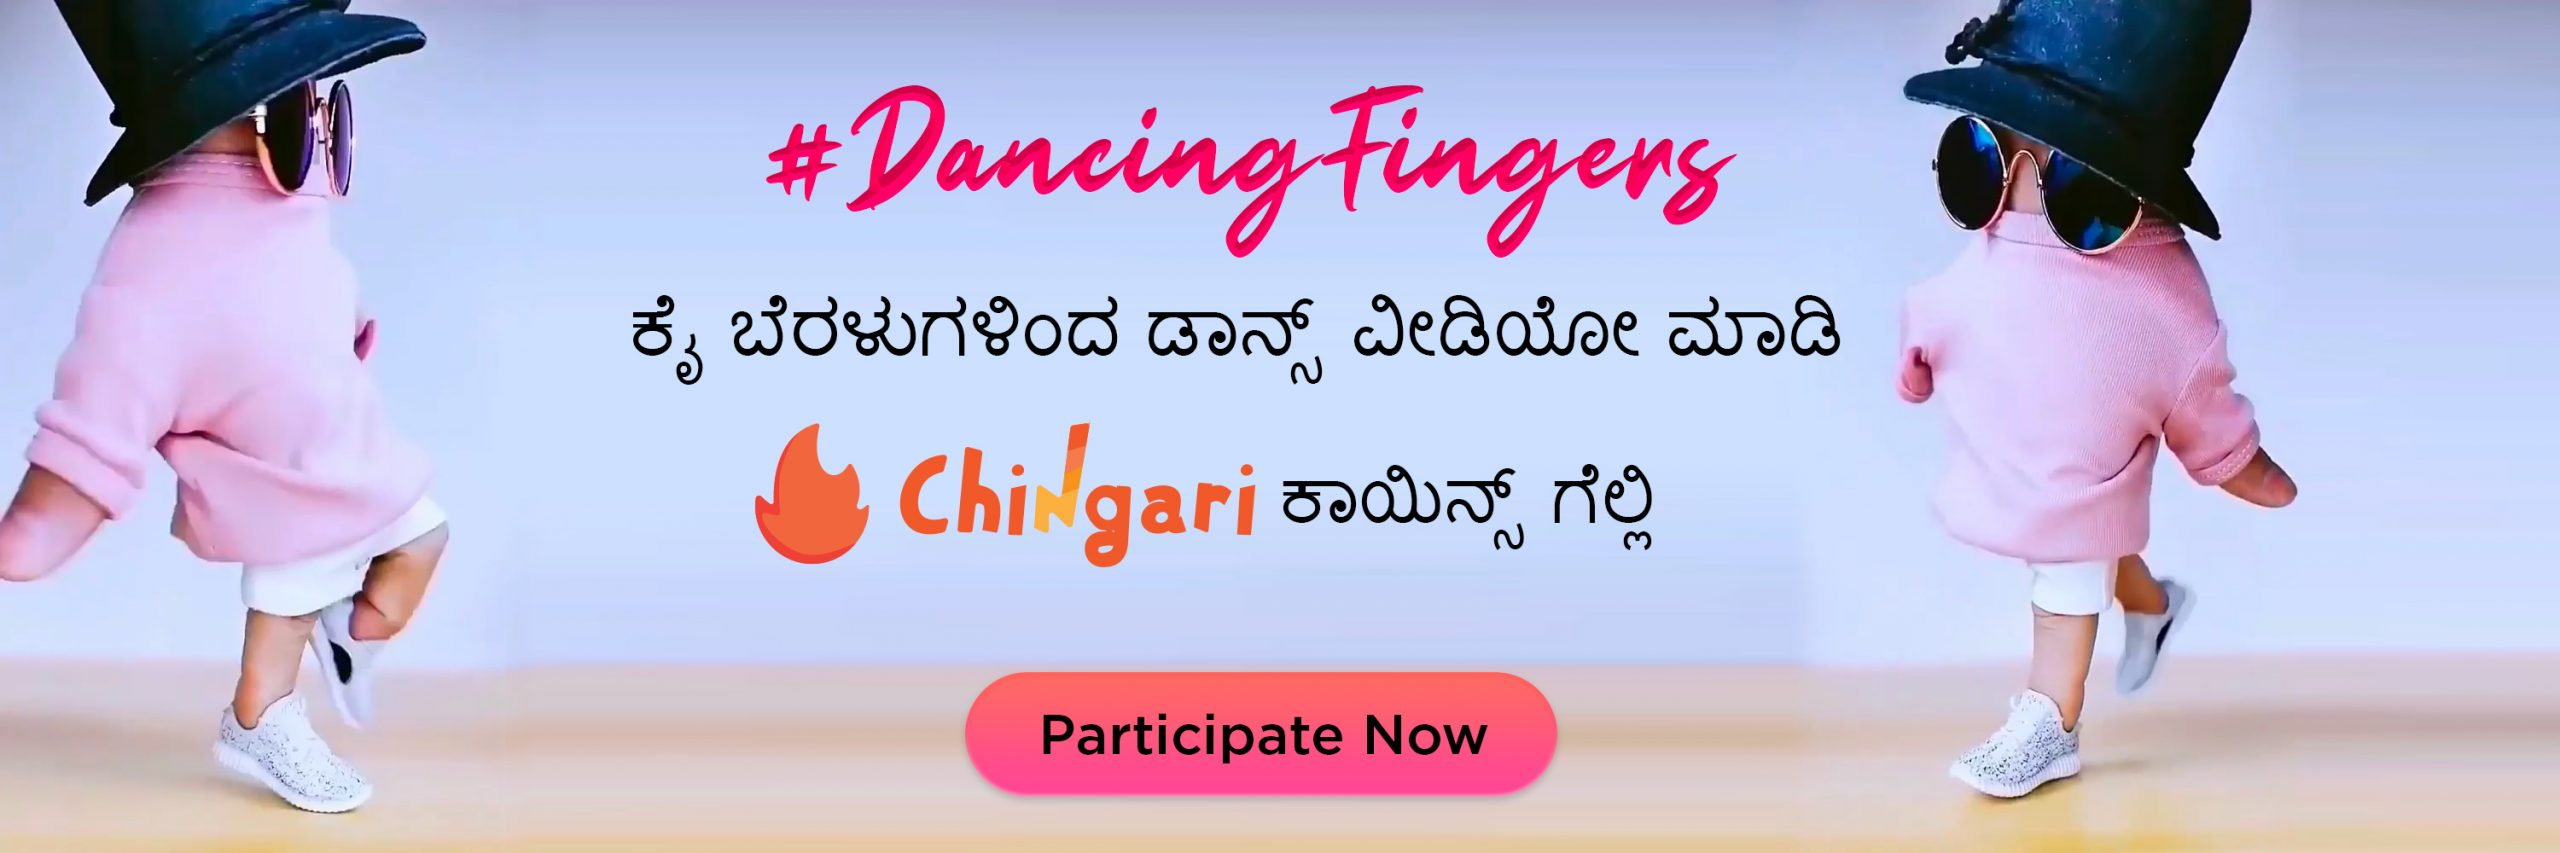 Dancing-Fingers-Kannada-Banner